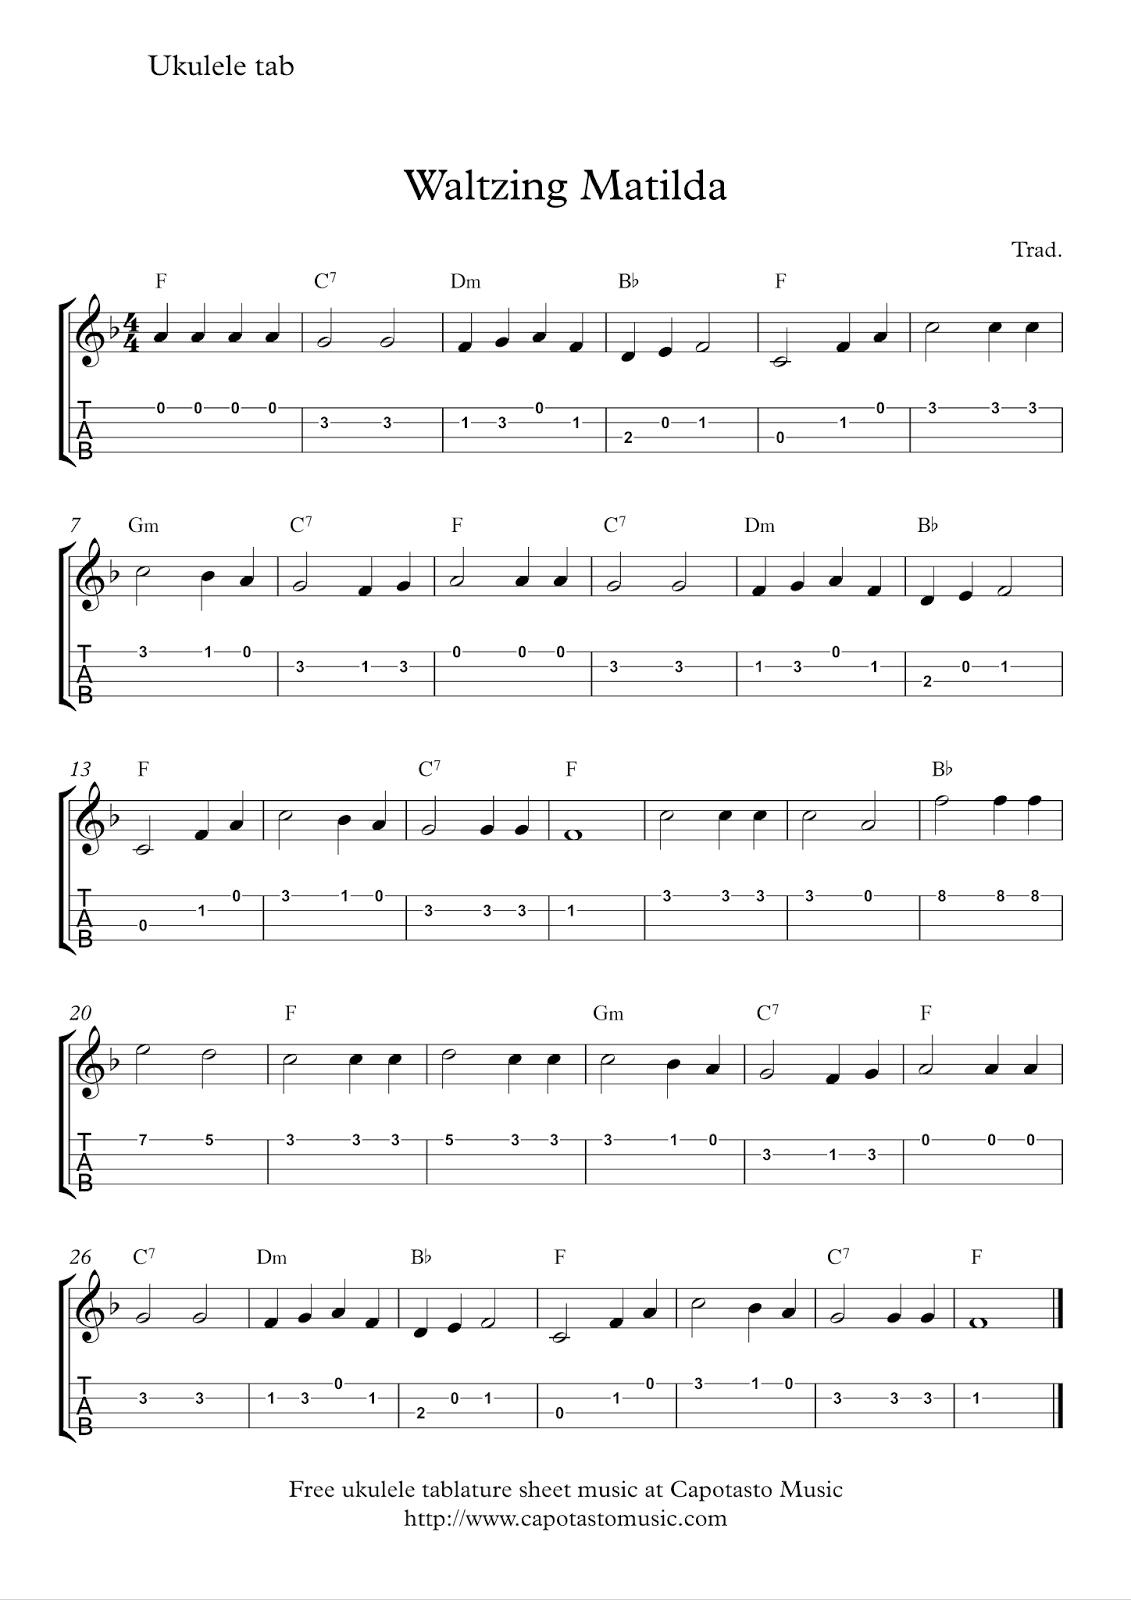 Free ukulele tab sheet music, Waltzing Matilda